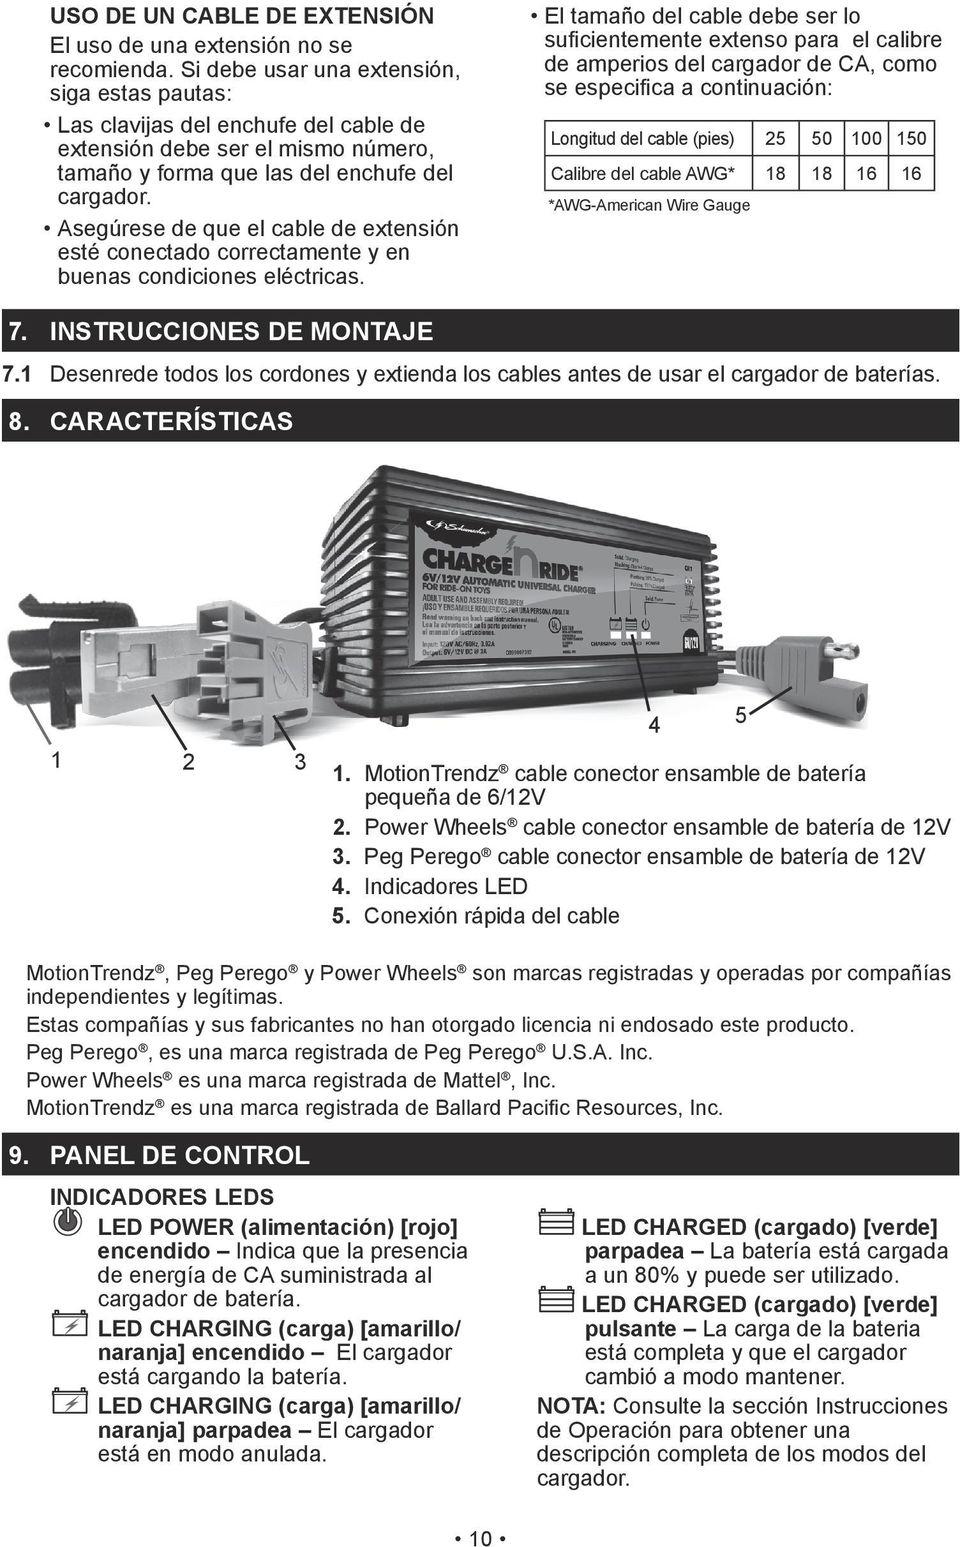 Model / Modelo: Cr1 6V/12V Universal Charger For Ride-On Toys 6V/12V - Schumacher Battery Charger Se-5212A Wiring Diagram